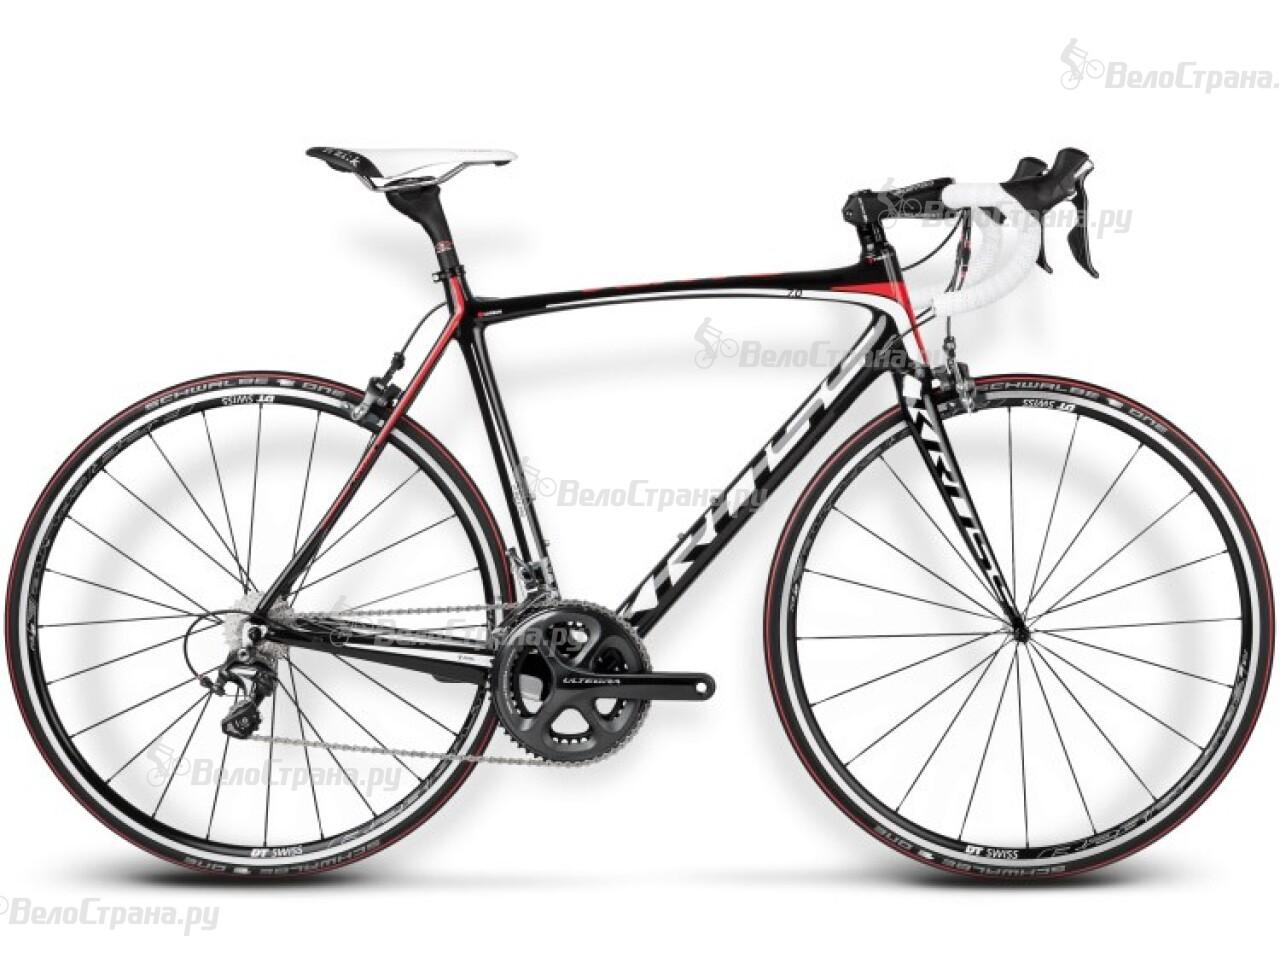 Велосипед Kross Vento 7.0 (2015) велосипед kross pulso 1 2015